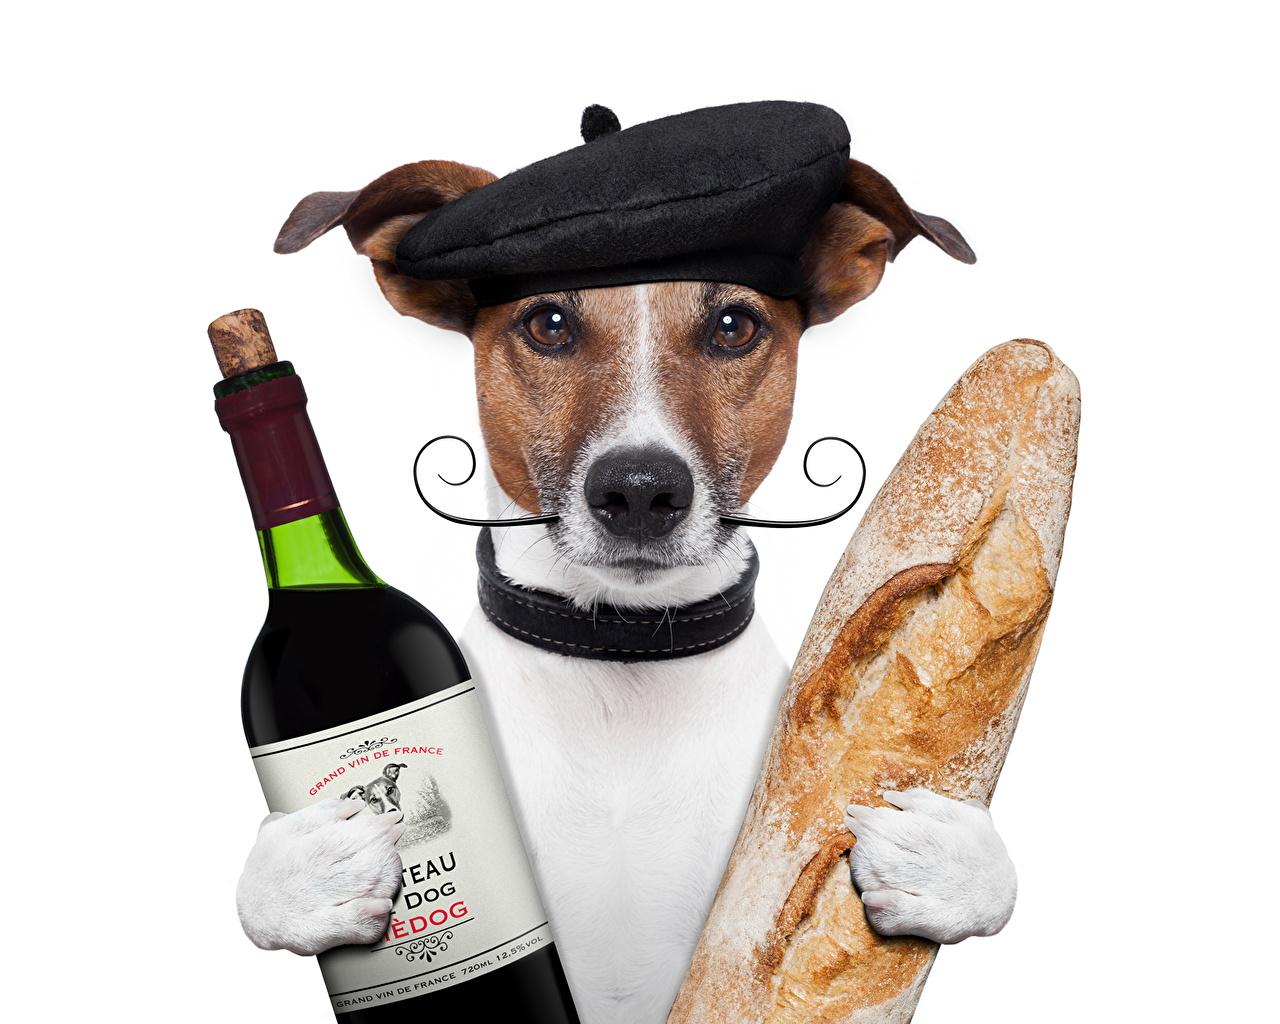 Wallpaper Animals Jack Russell terrier Dogs Wine Bread